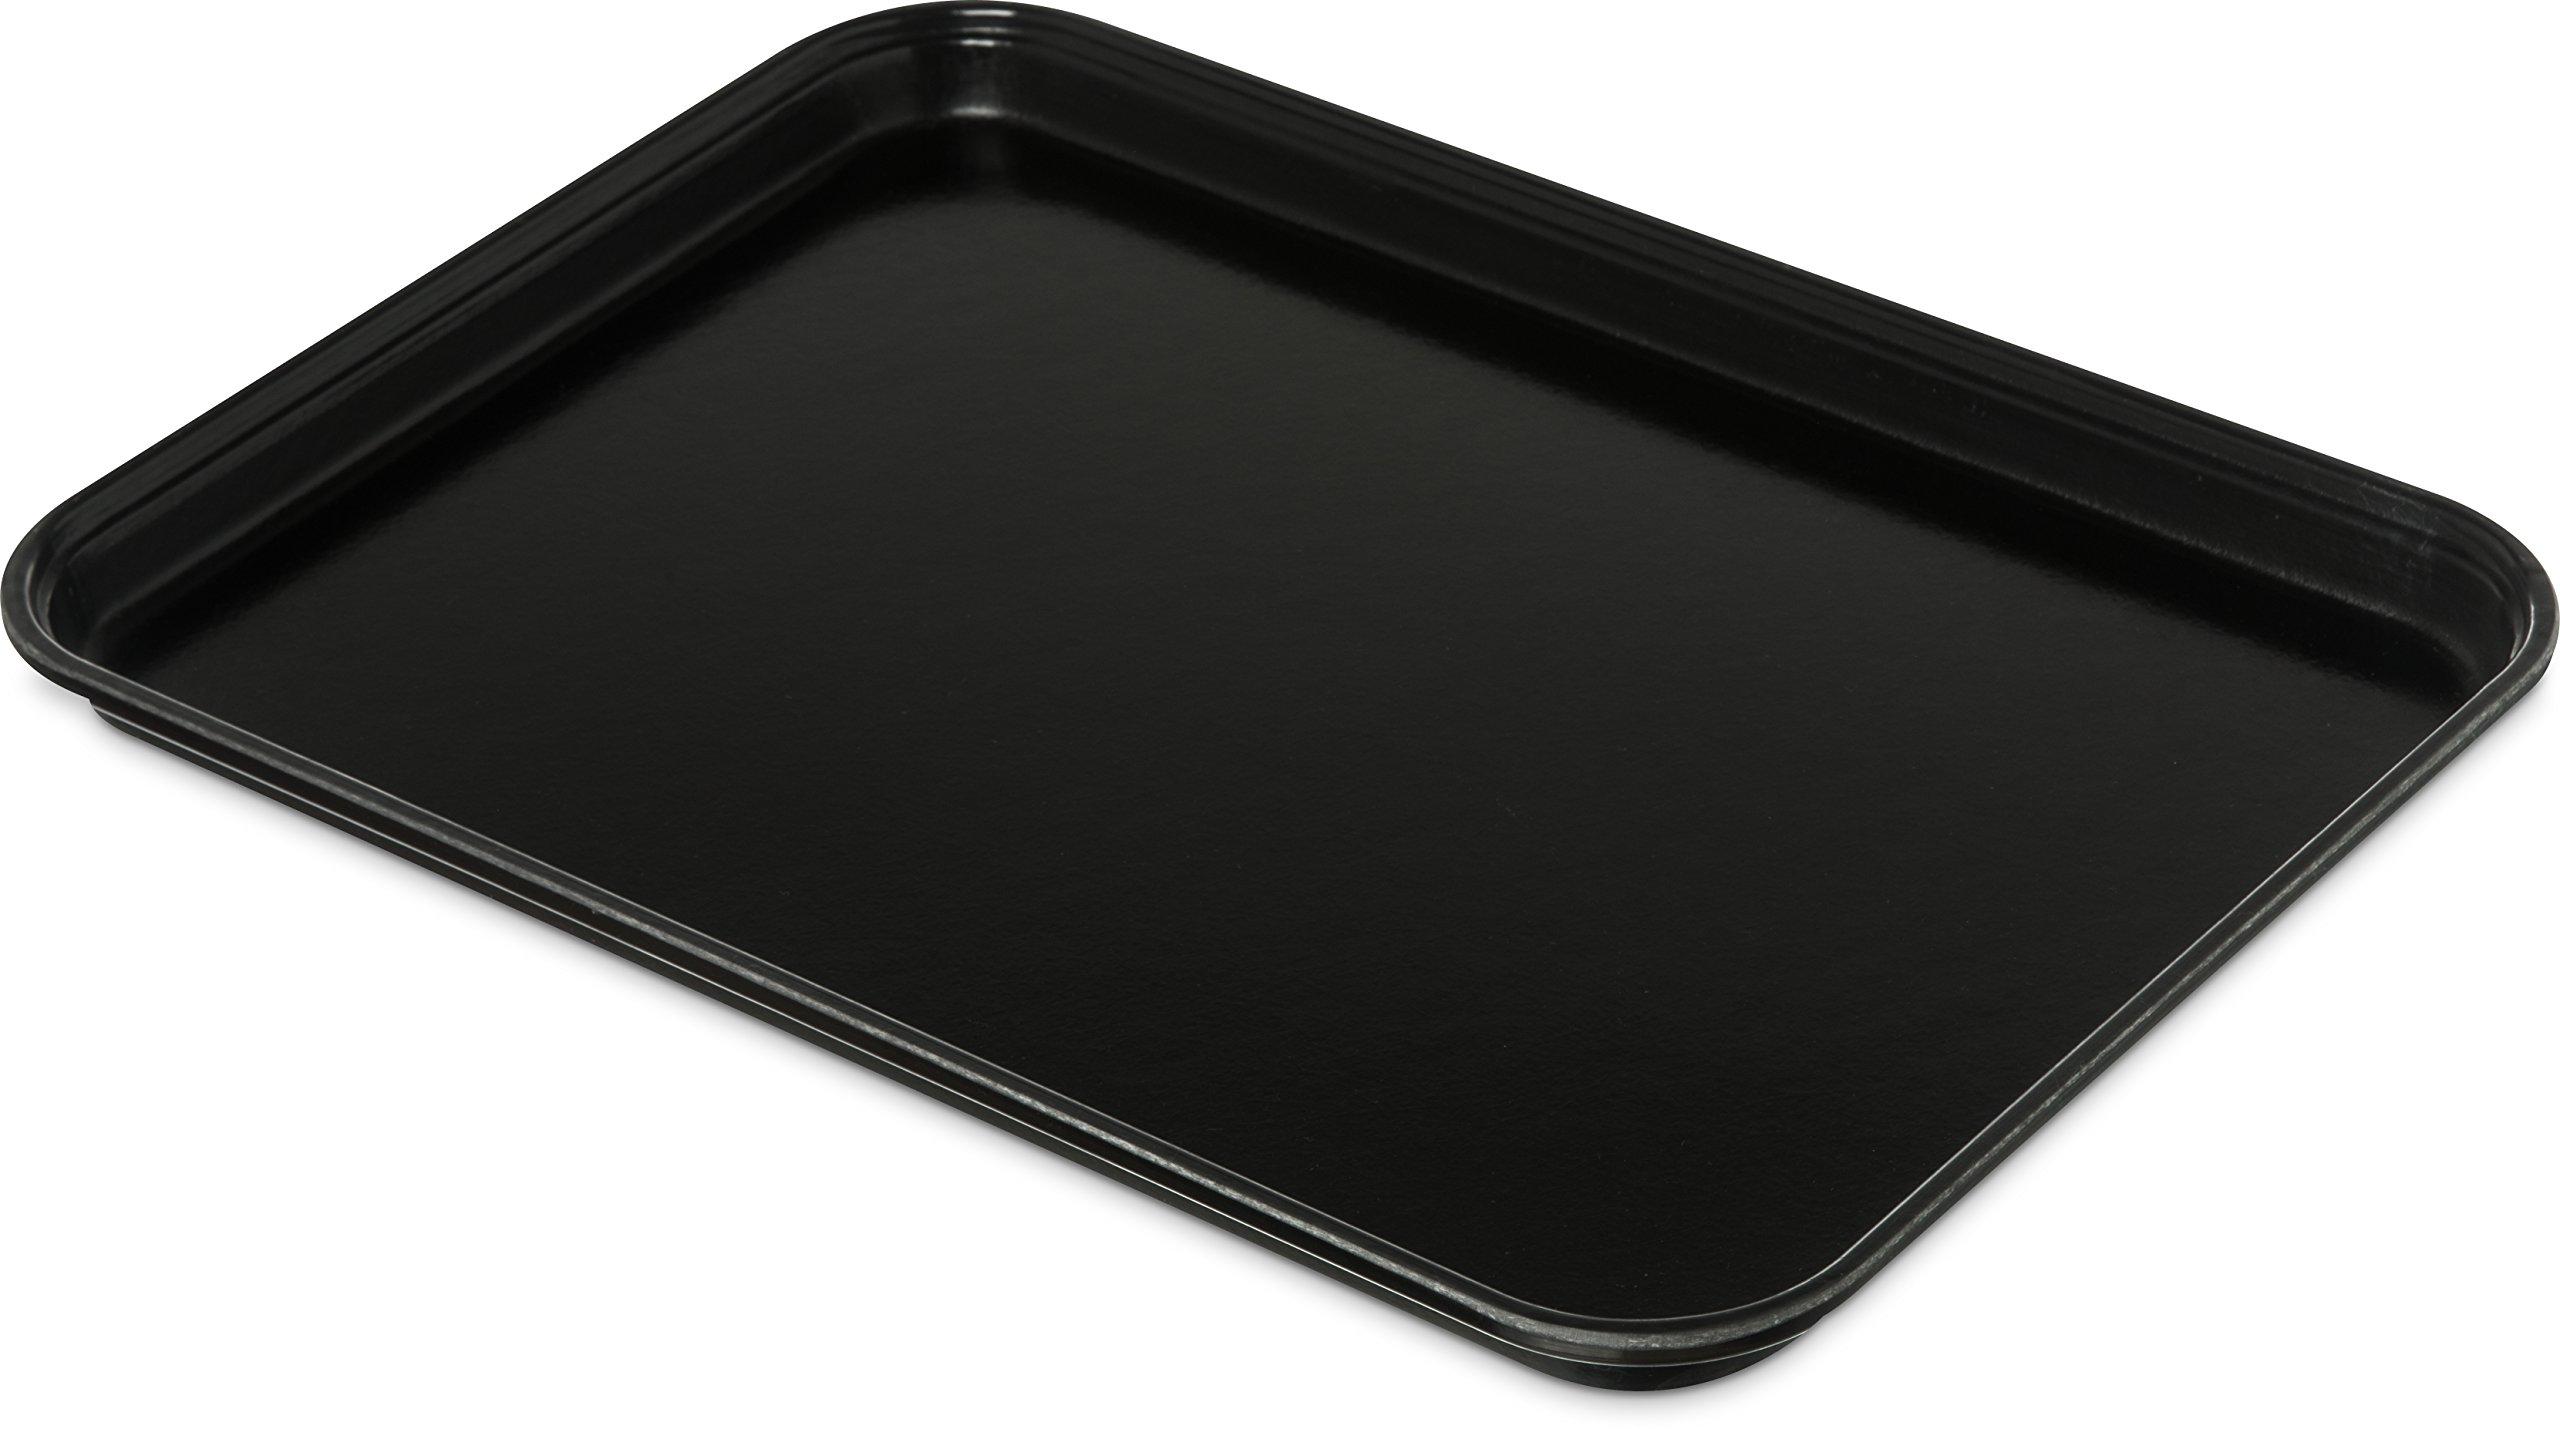 Carlisle 1318FMT309 Food Service Display Tray, 13'' x 18'', Black (Pack of 12)